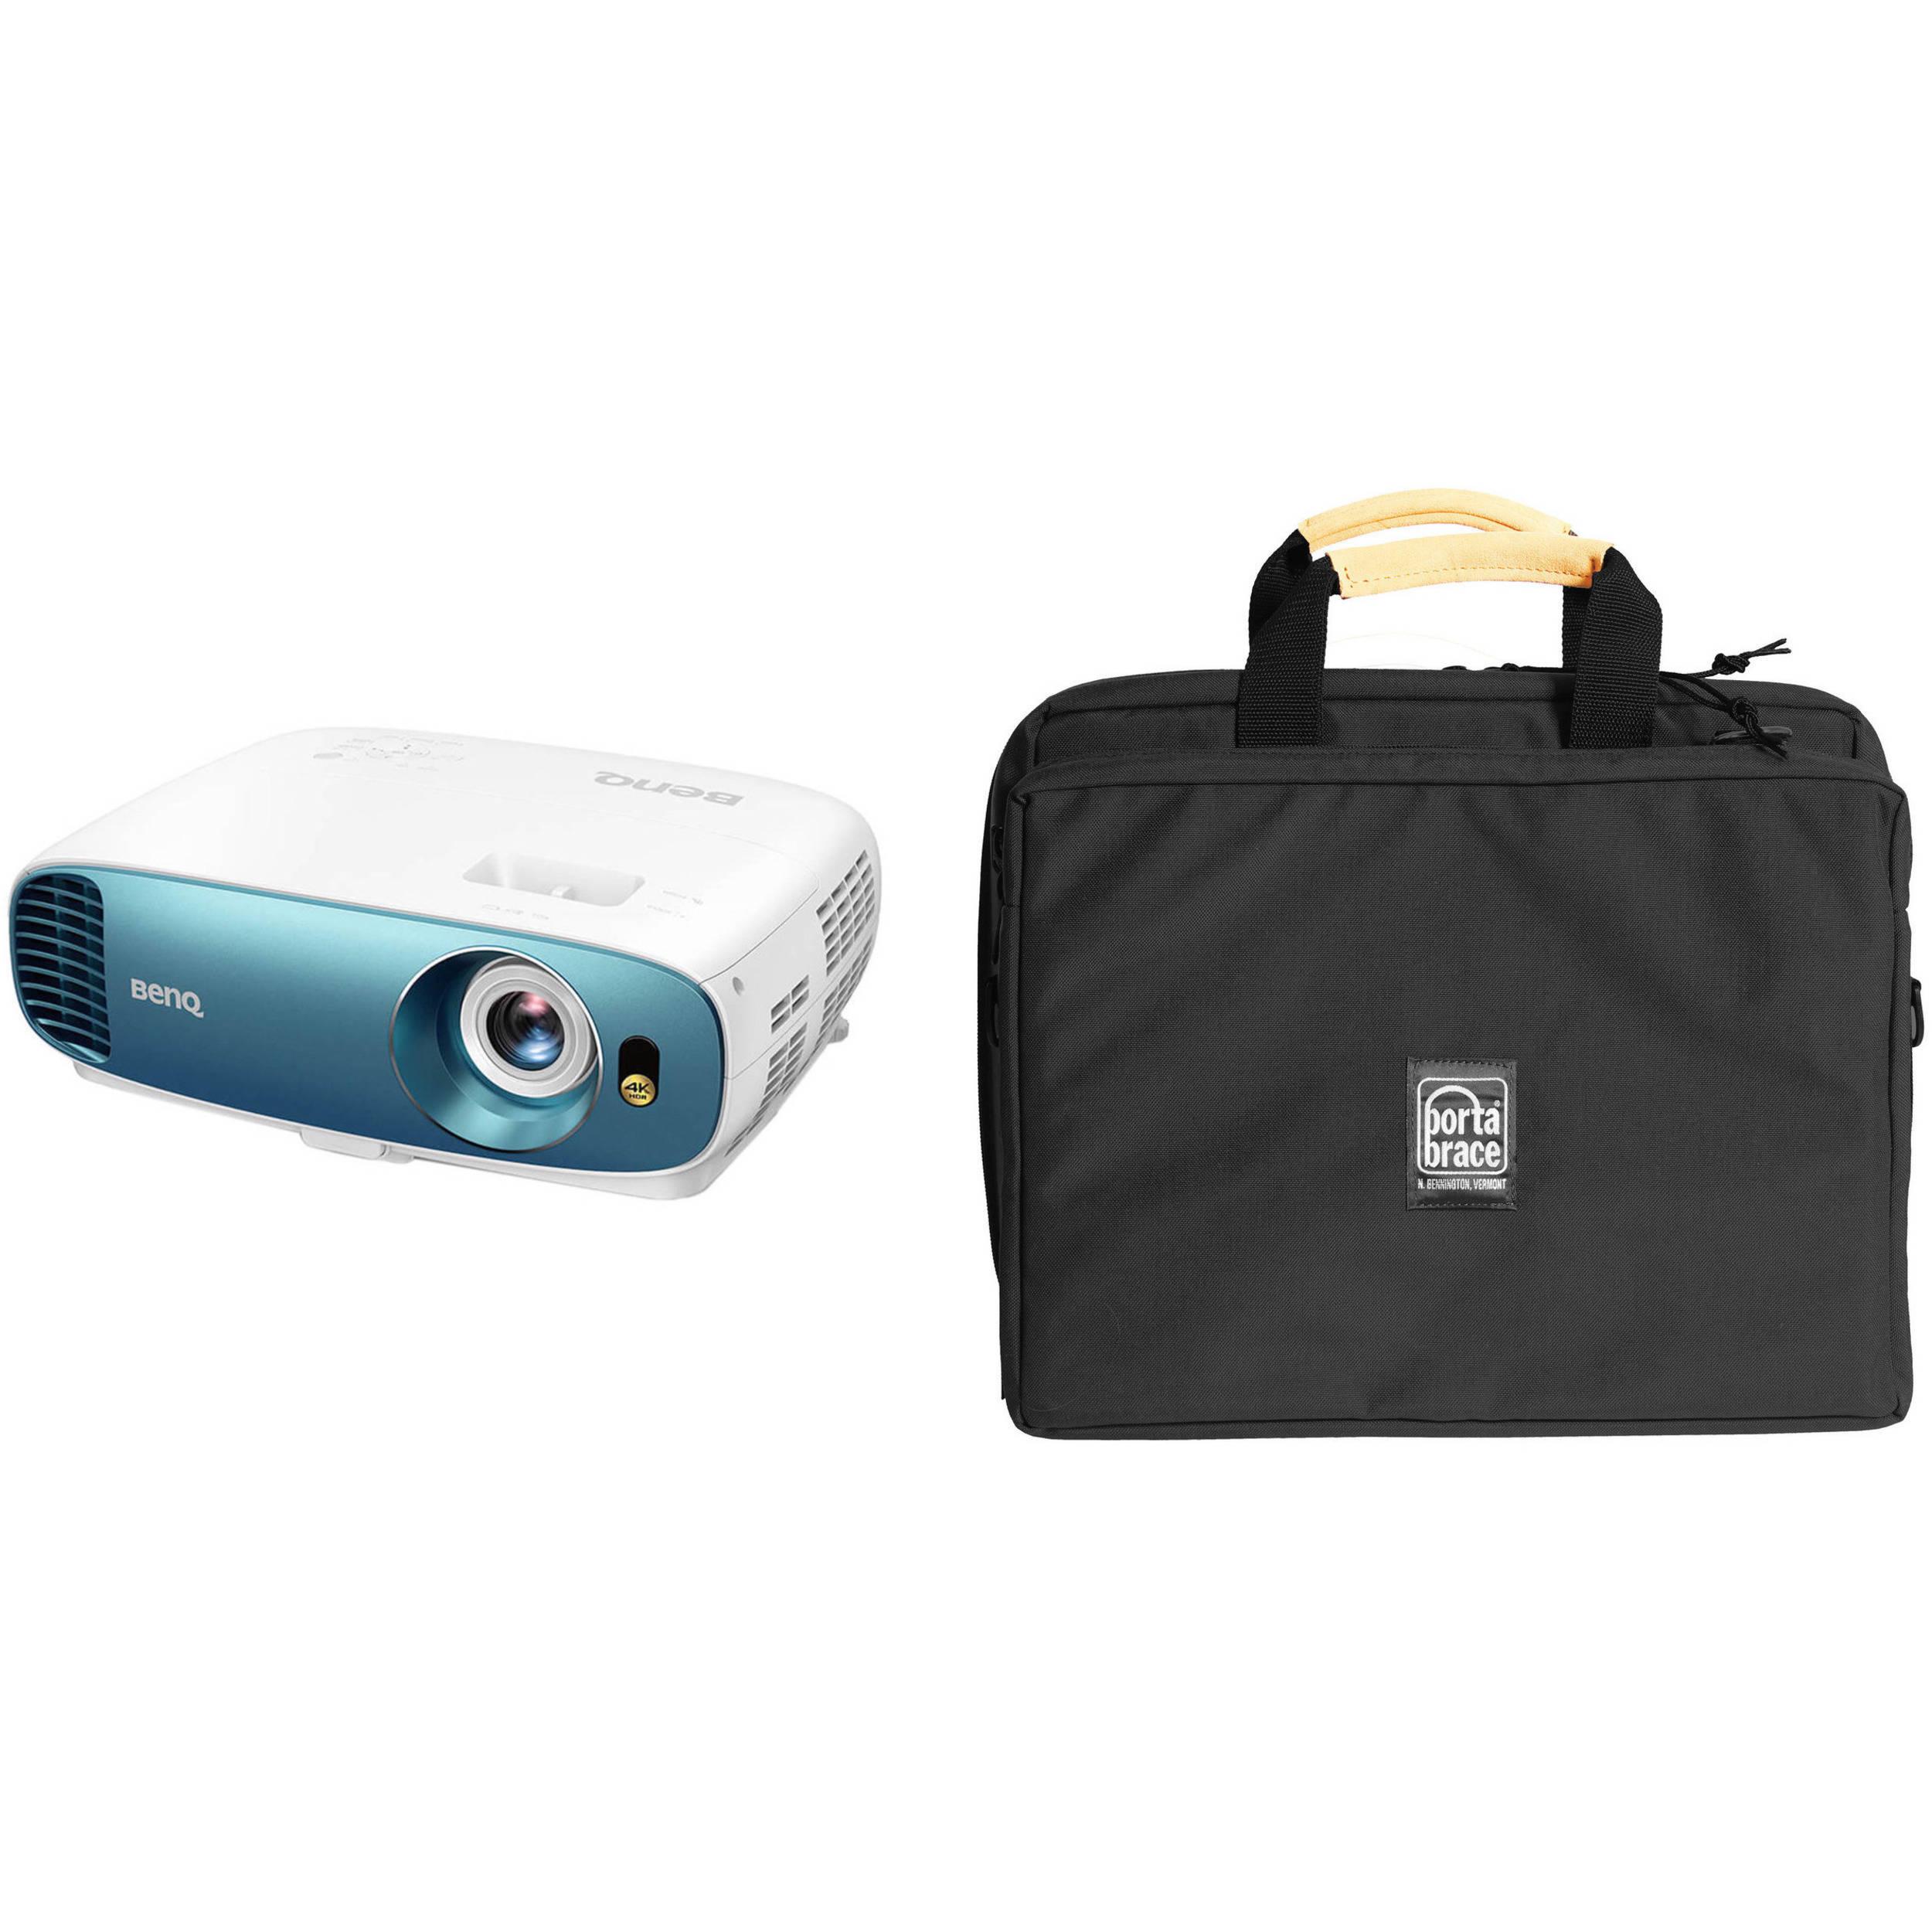 //2GB Rain Protection//Travel Bag//Set of 2 GB Pockit Travel Kit